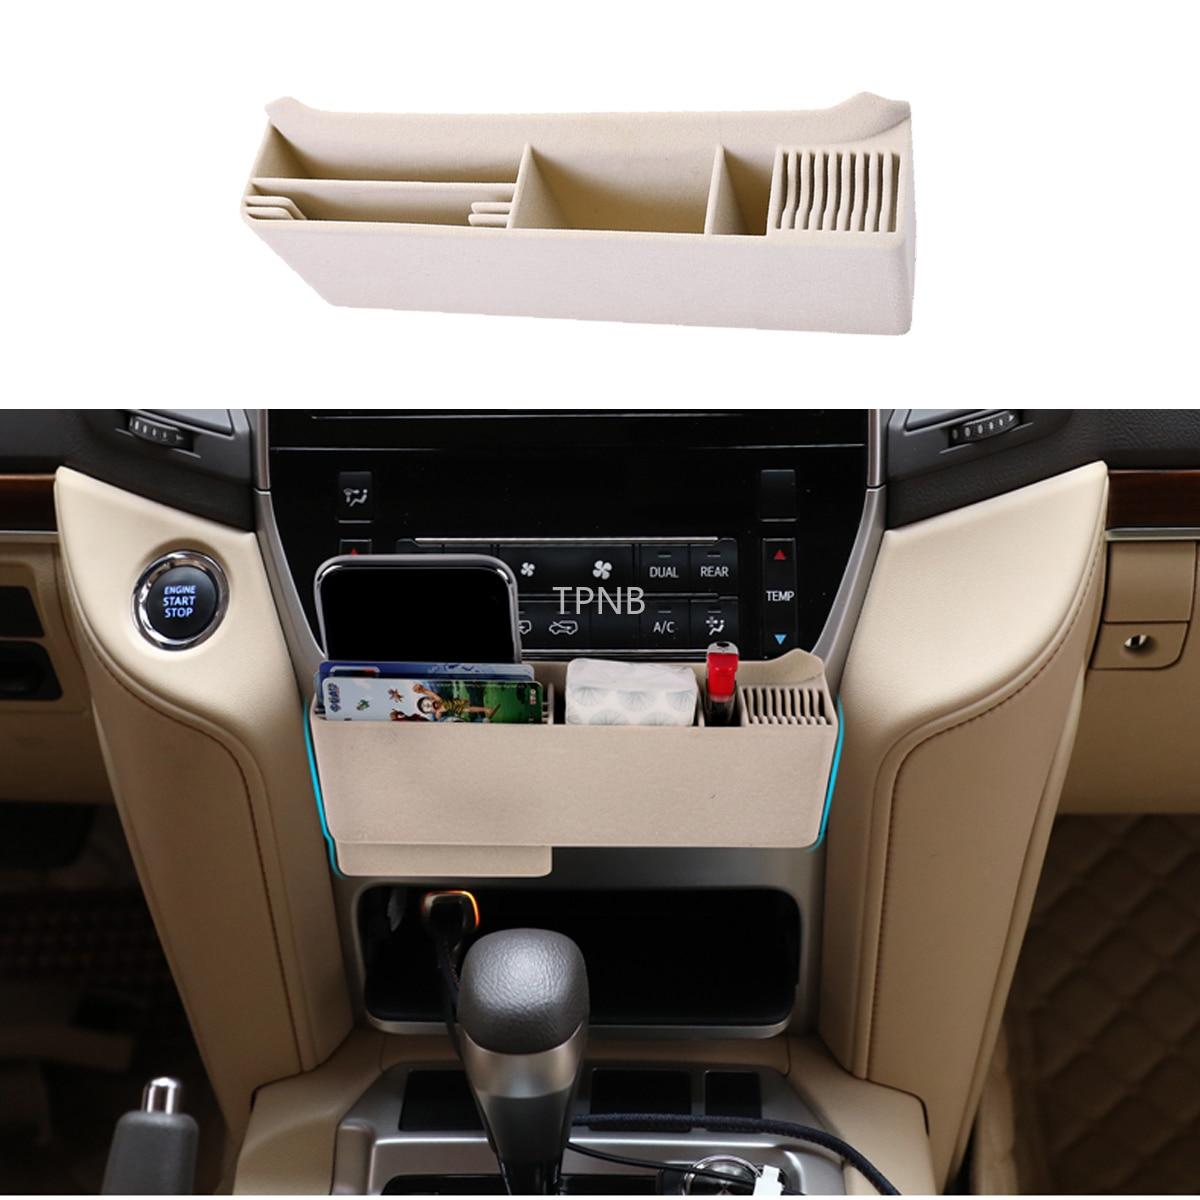 ><font><b>Car</b></font> <font><b>Central</b></font> <font><b>Control</b></font> Storage Box Card Storage Frame for Toyota Land Cruiser 200 2016 2017 2018 2019 <font><b>Car</b></font> Accessories